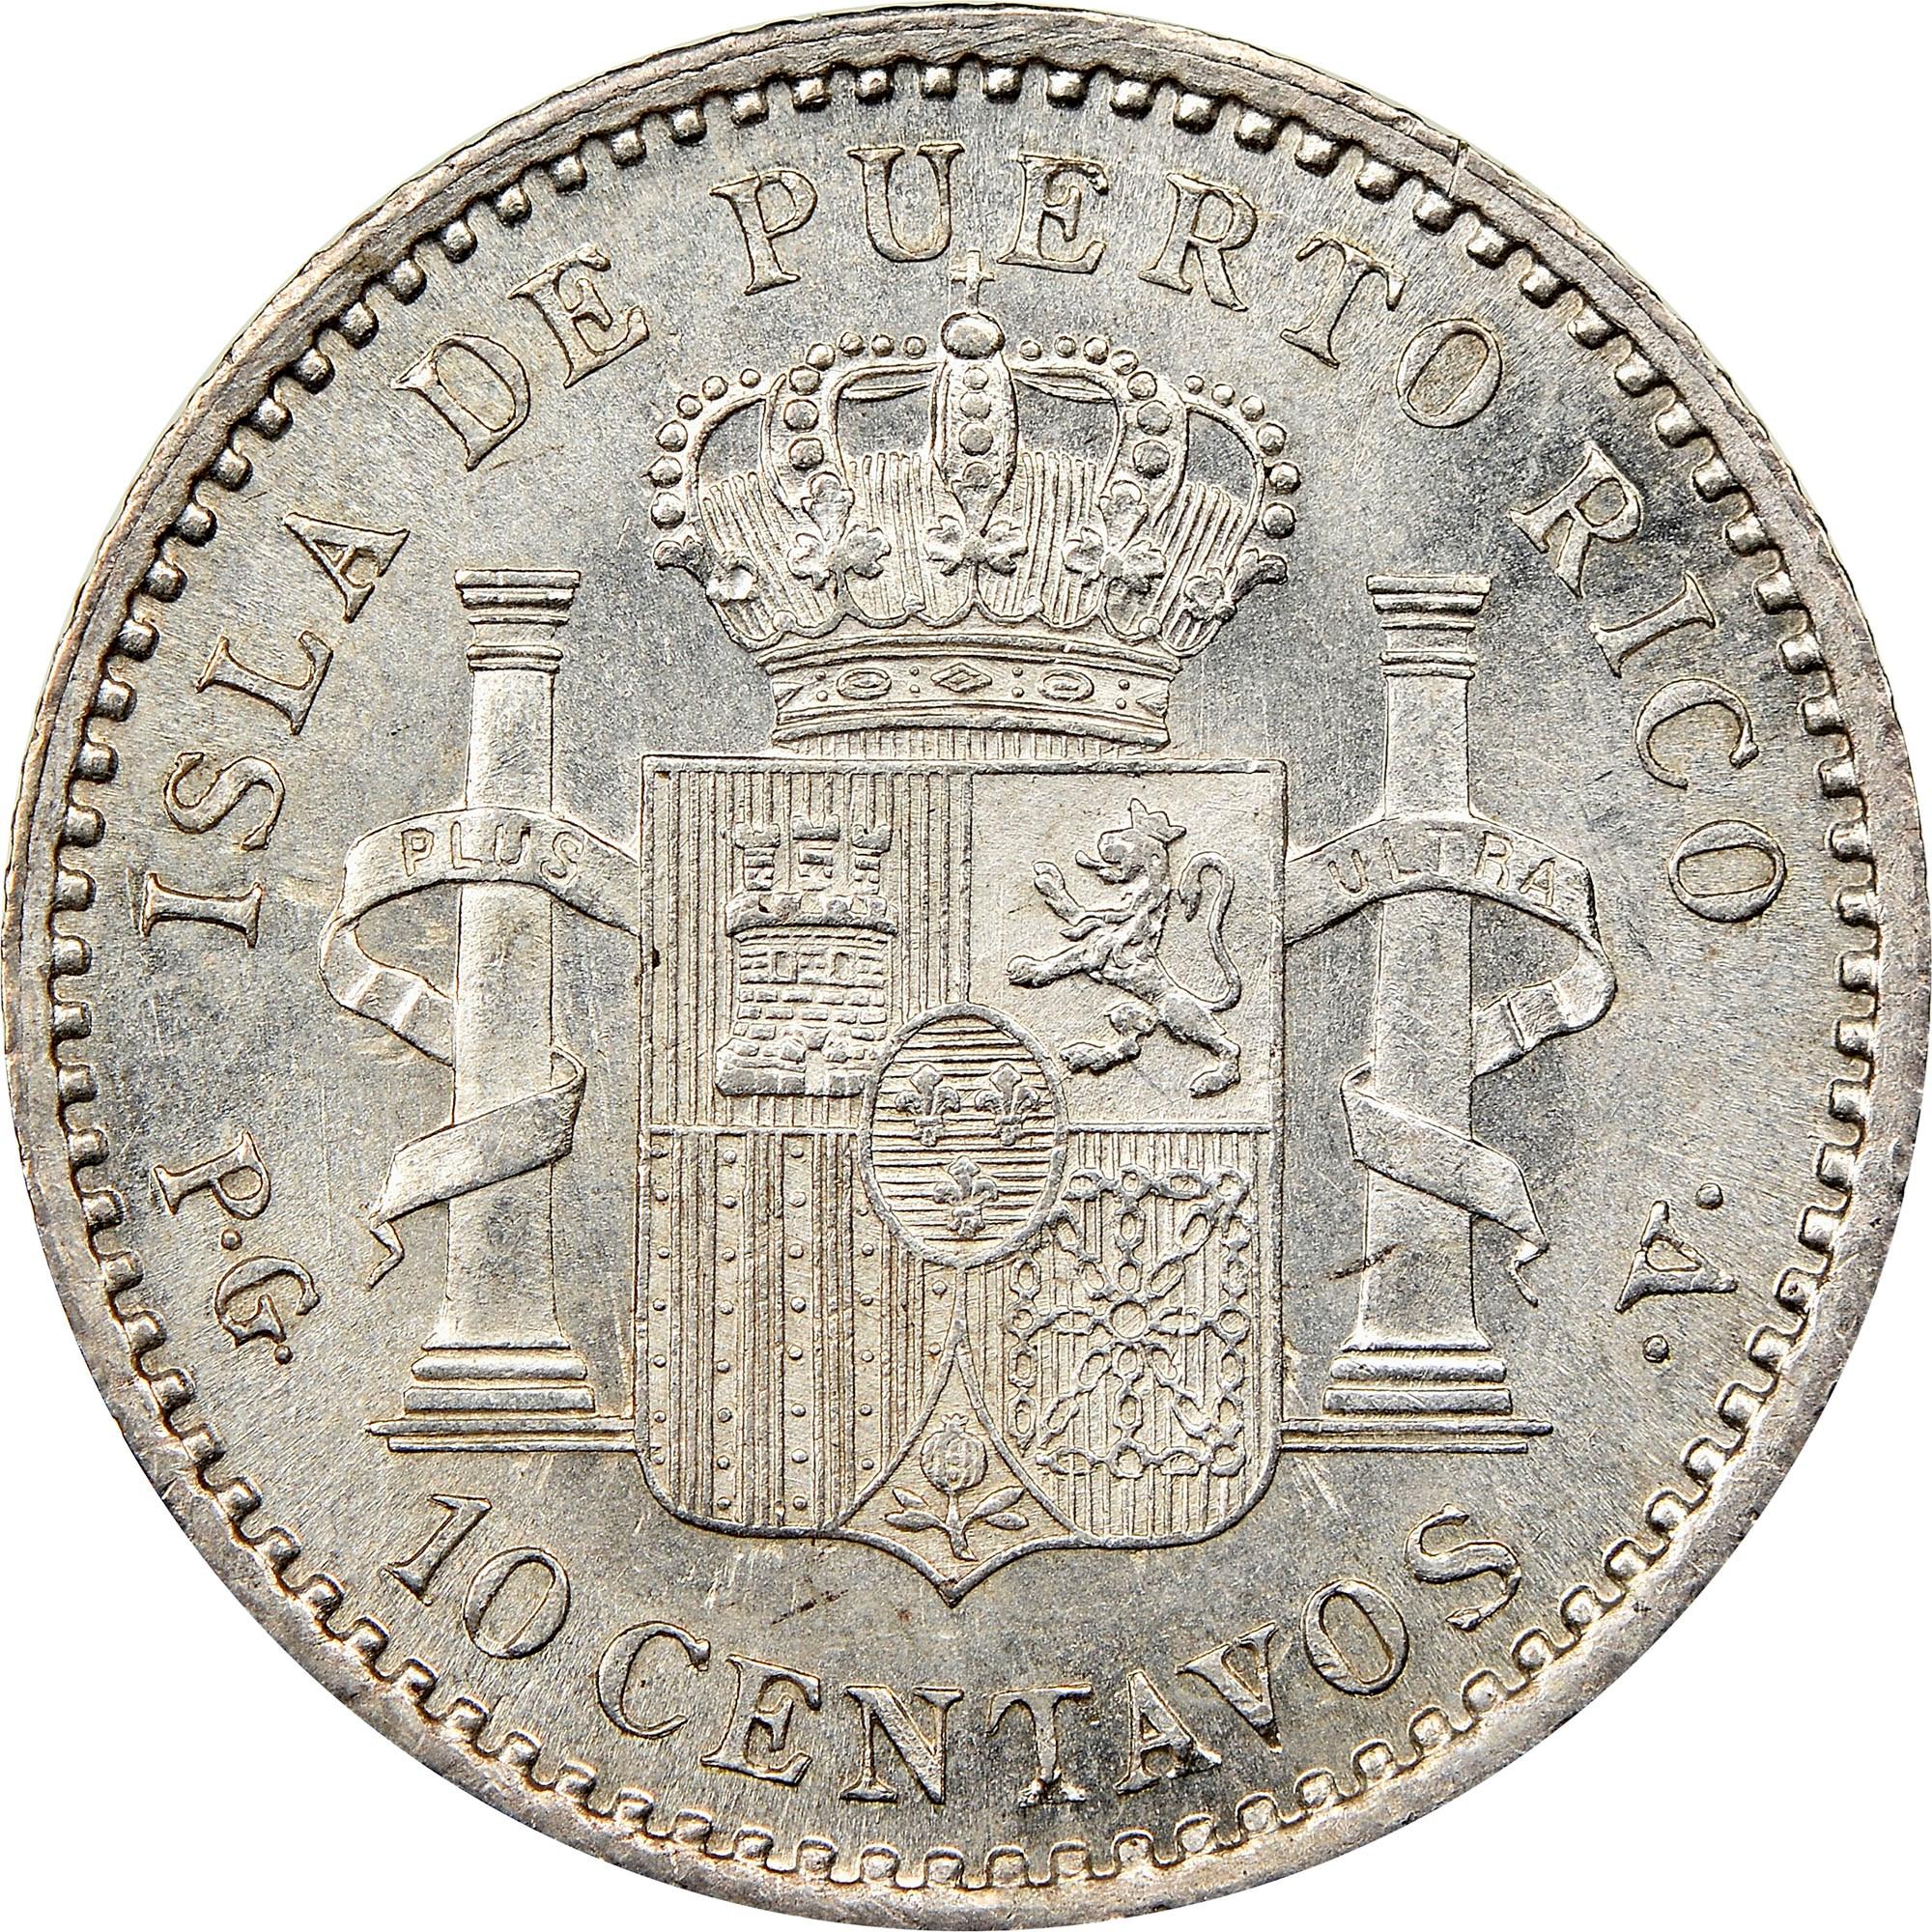 Puerto Rico 10 Centavos reverse